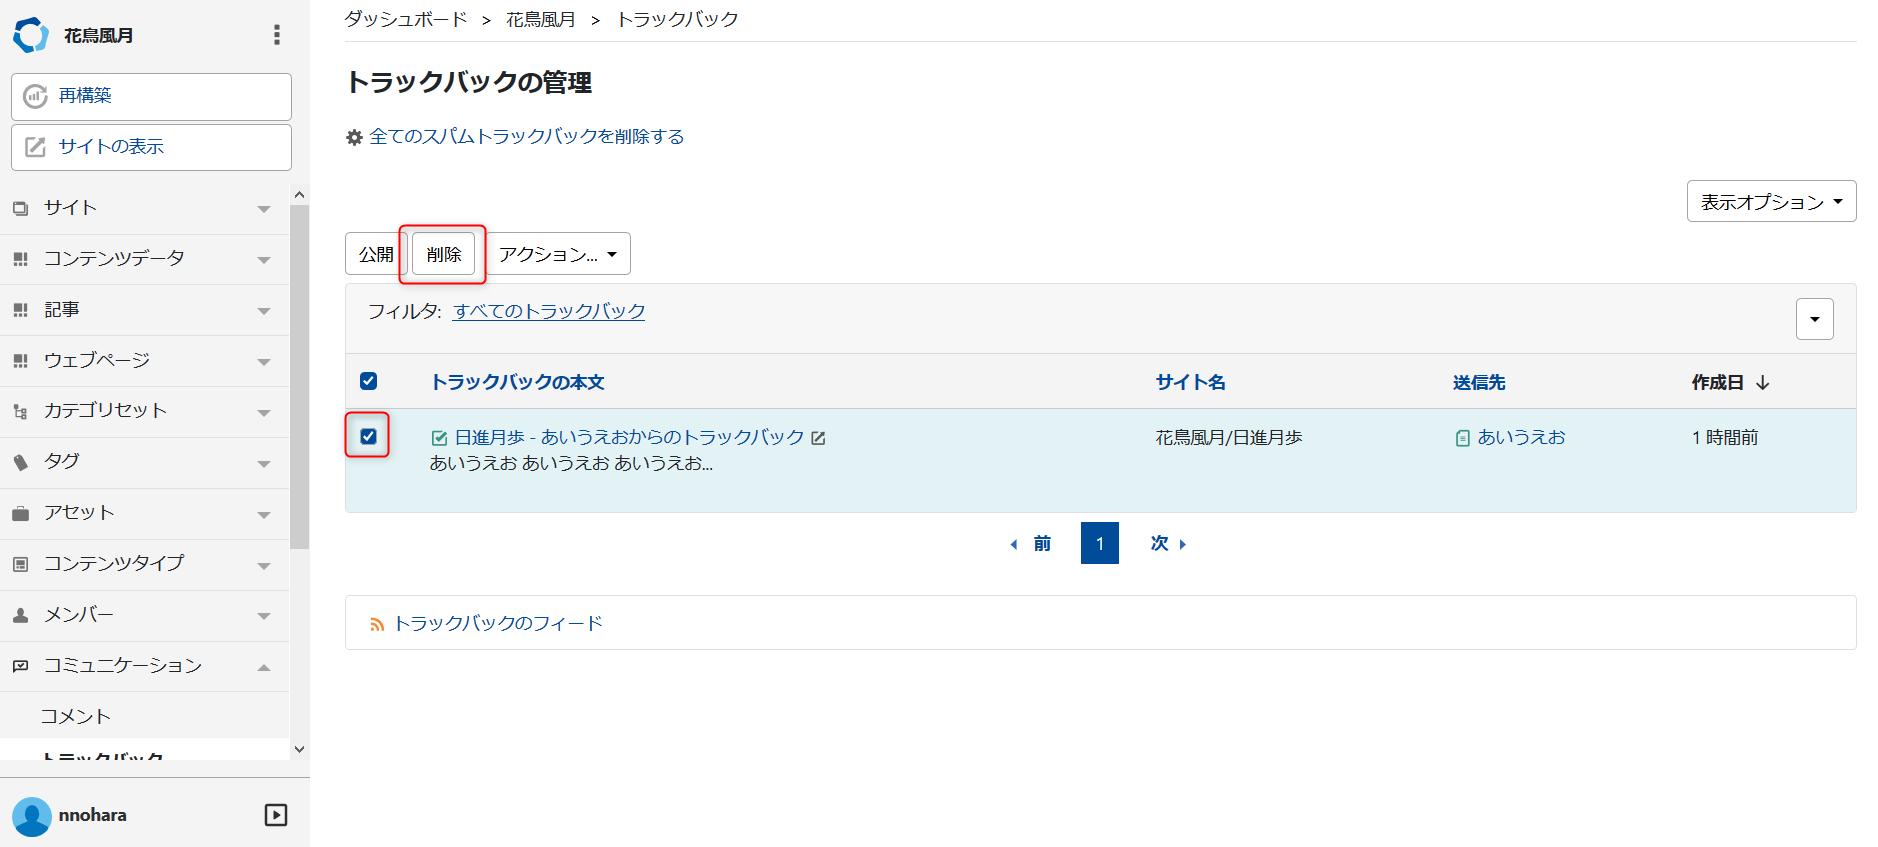 delete-trackback01.png